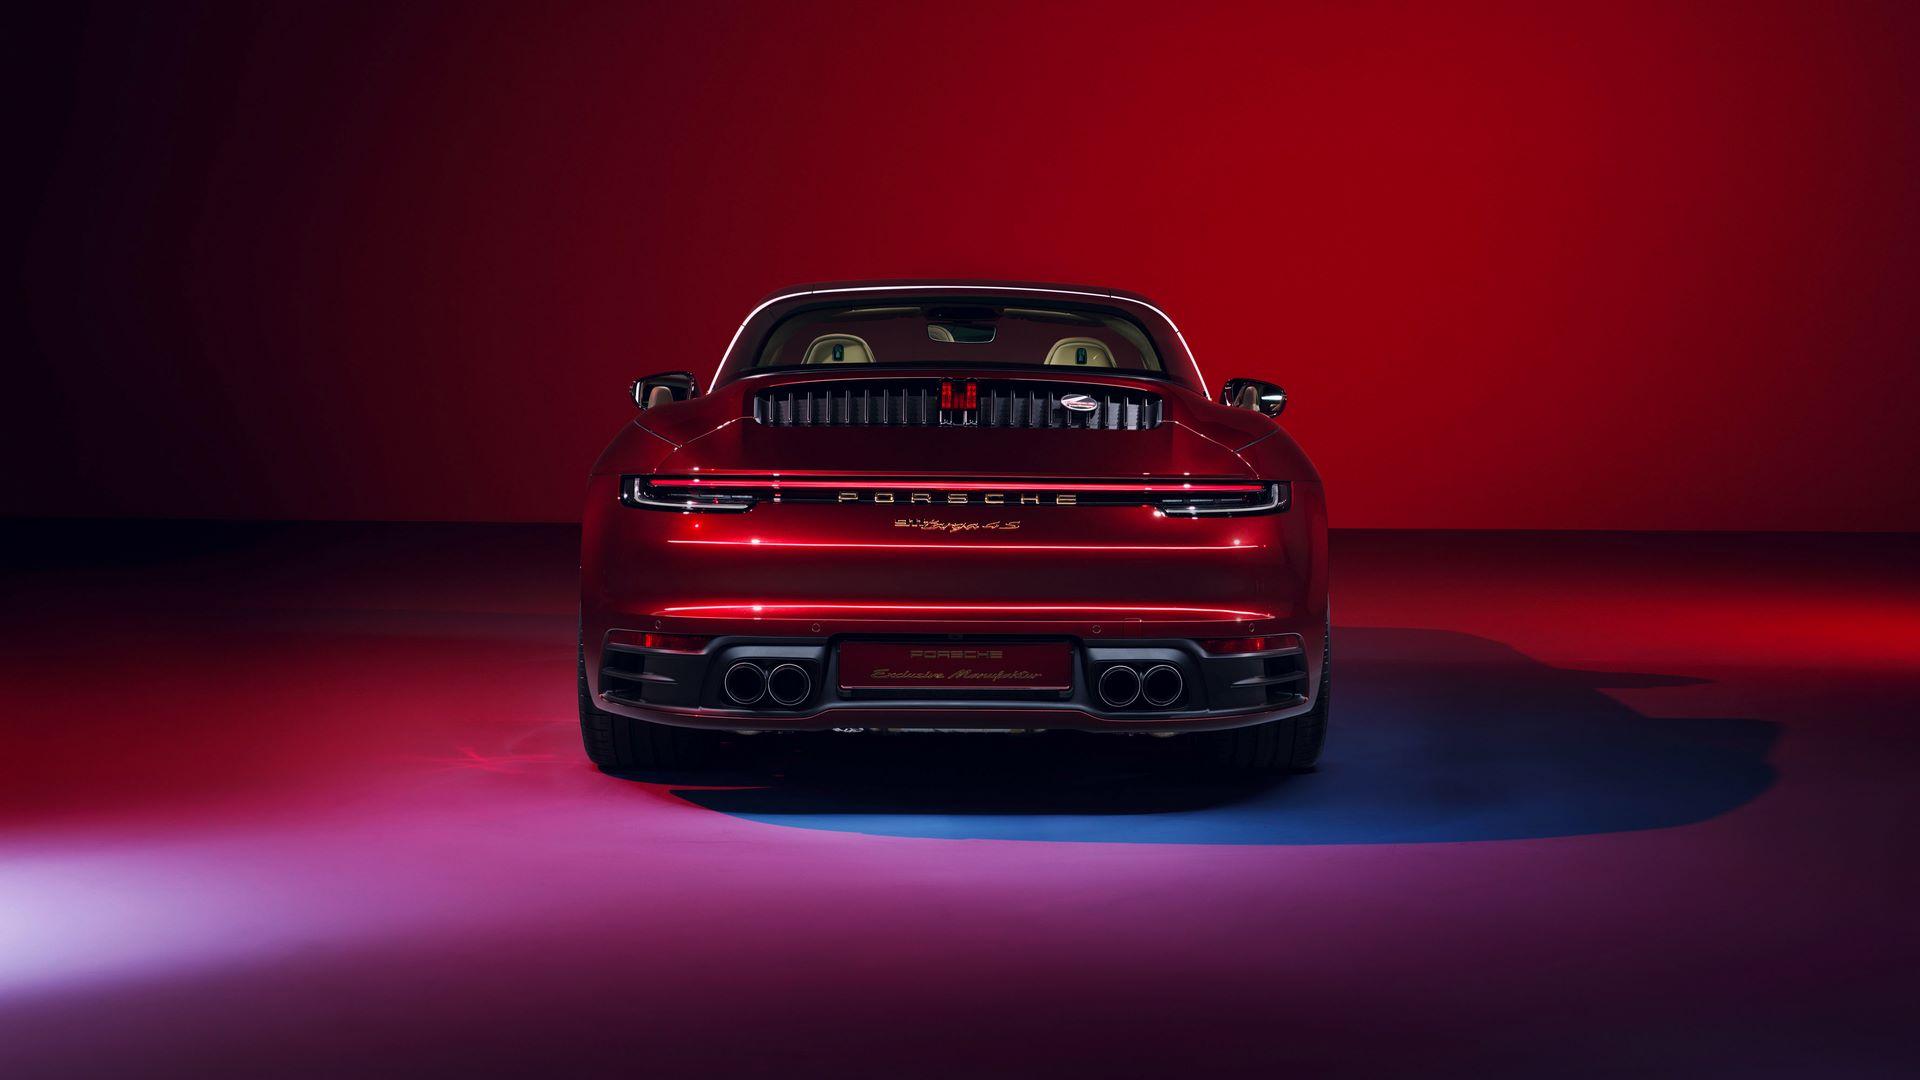 Porsche-911-Targa-4S-Heritage-Design-Edition-4